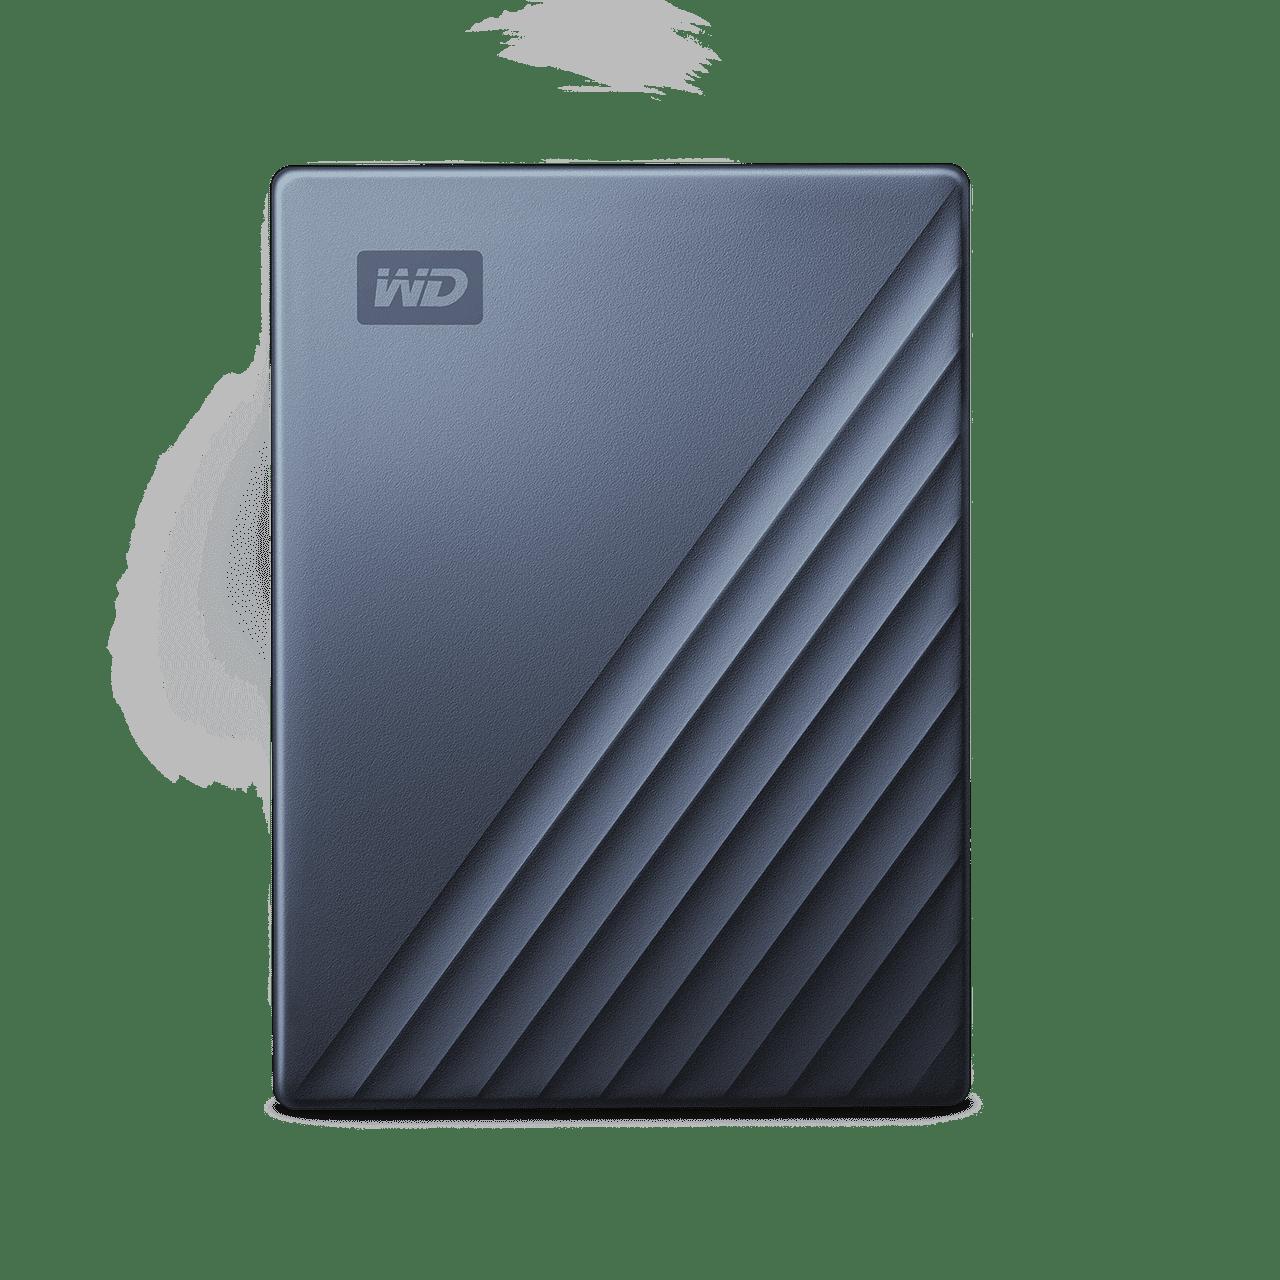 WD My Passport Ultra WDBFTM0050BBL 5 TB Portable Hard Drive - External - Blue